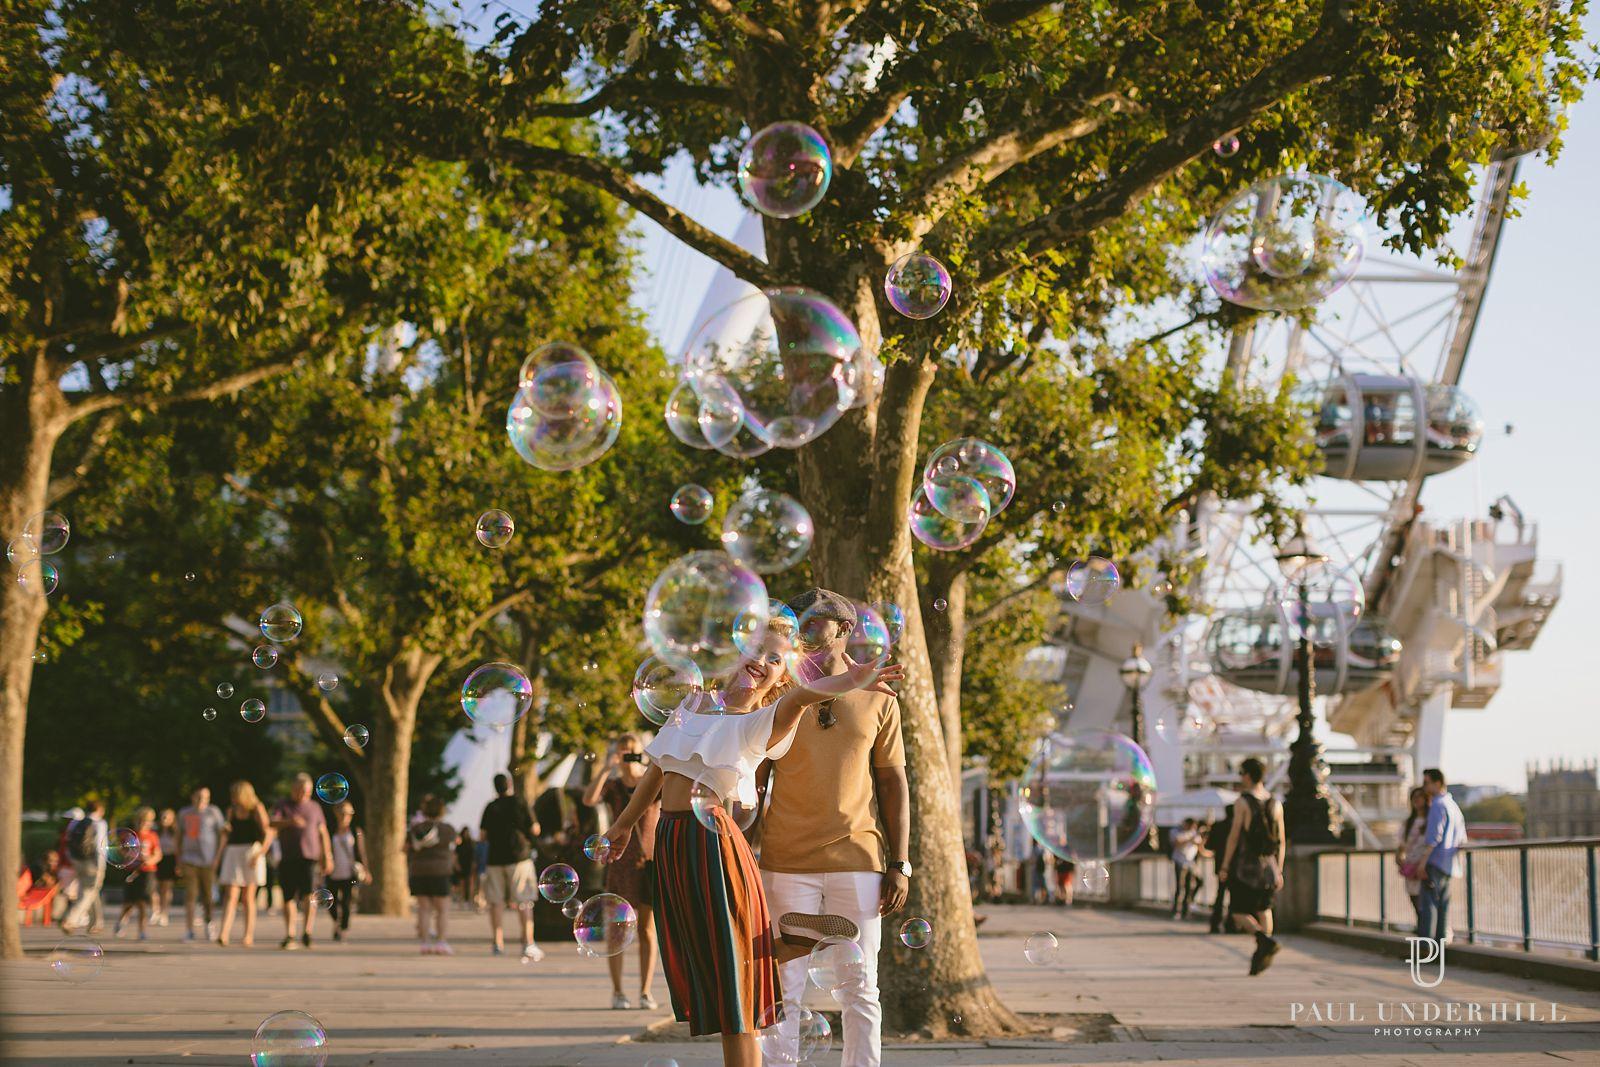 street-photography-southbank-london